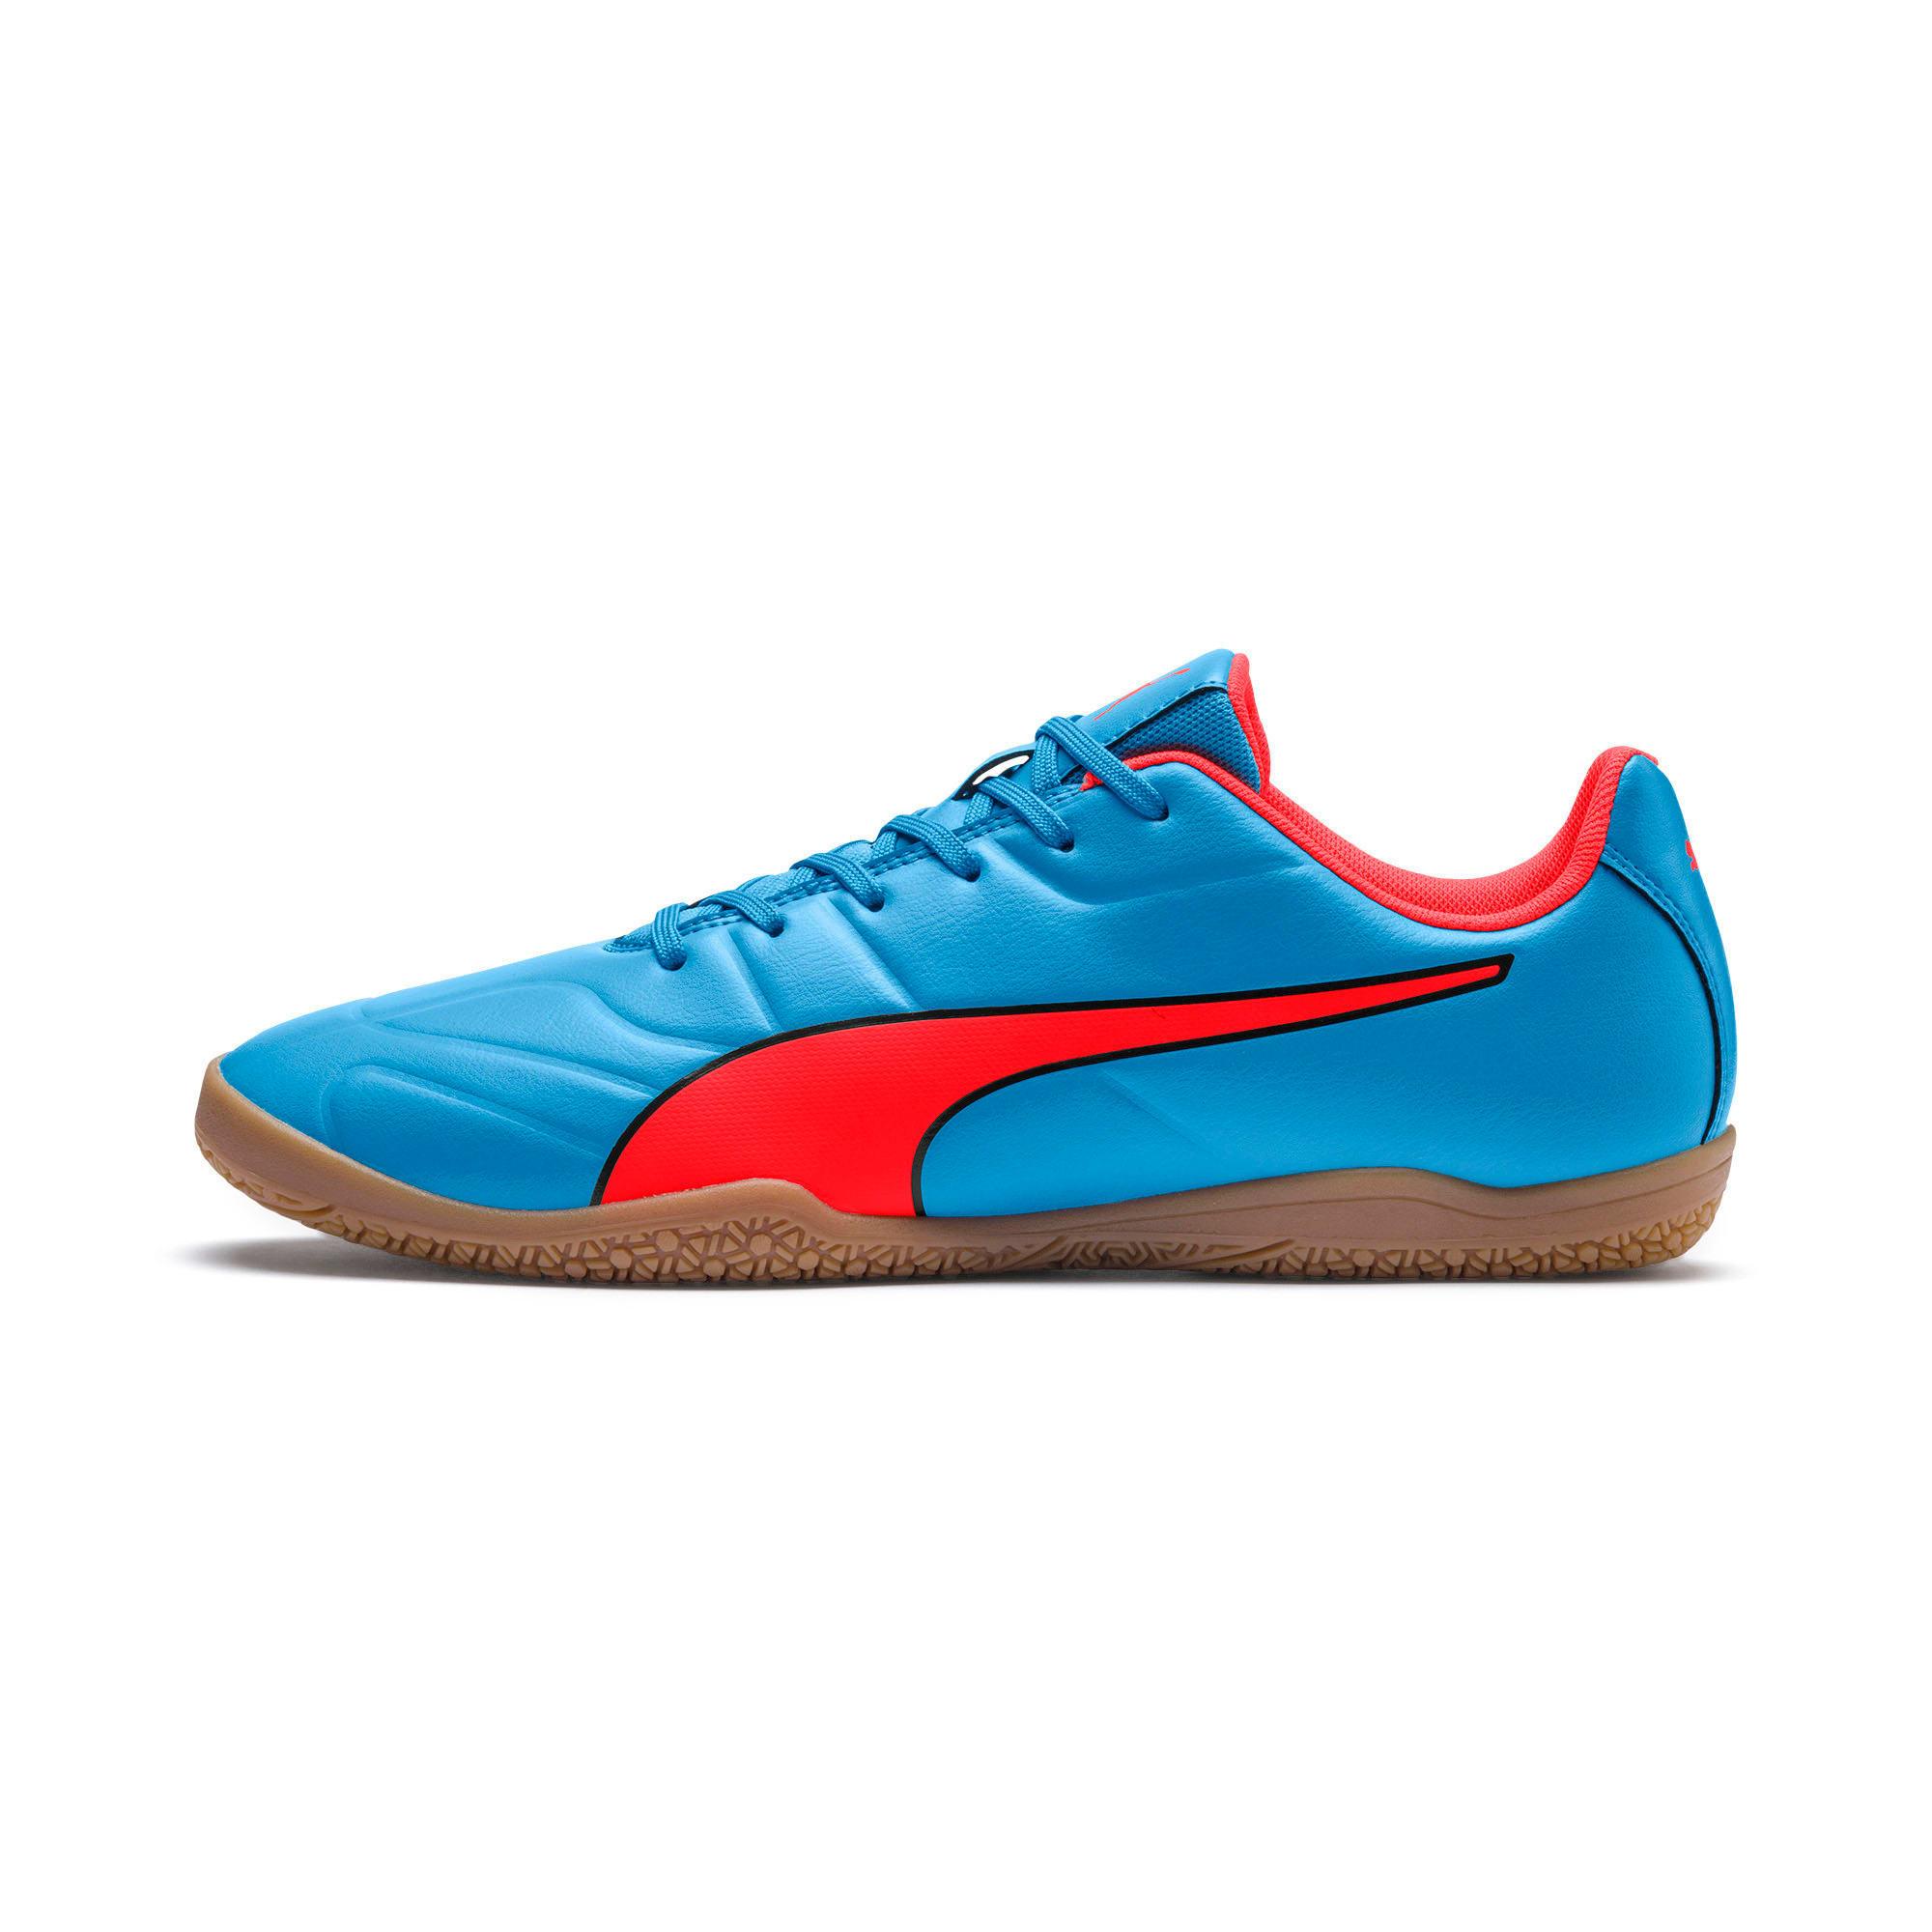 Thumbnail 1 of Classico C II Sala Men's Football Boots, Bleu Azur-Red Blast-Black, medium-IND